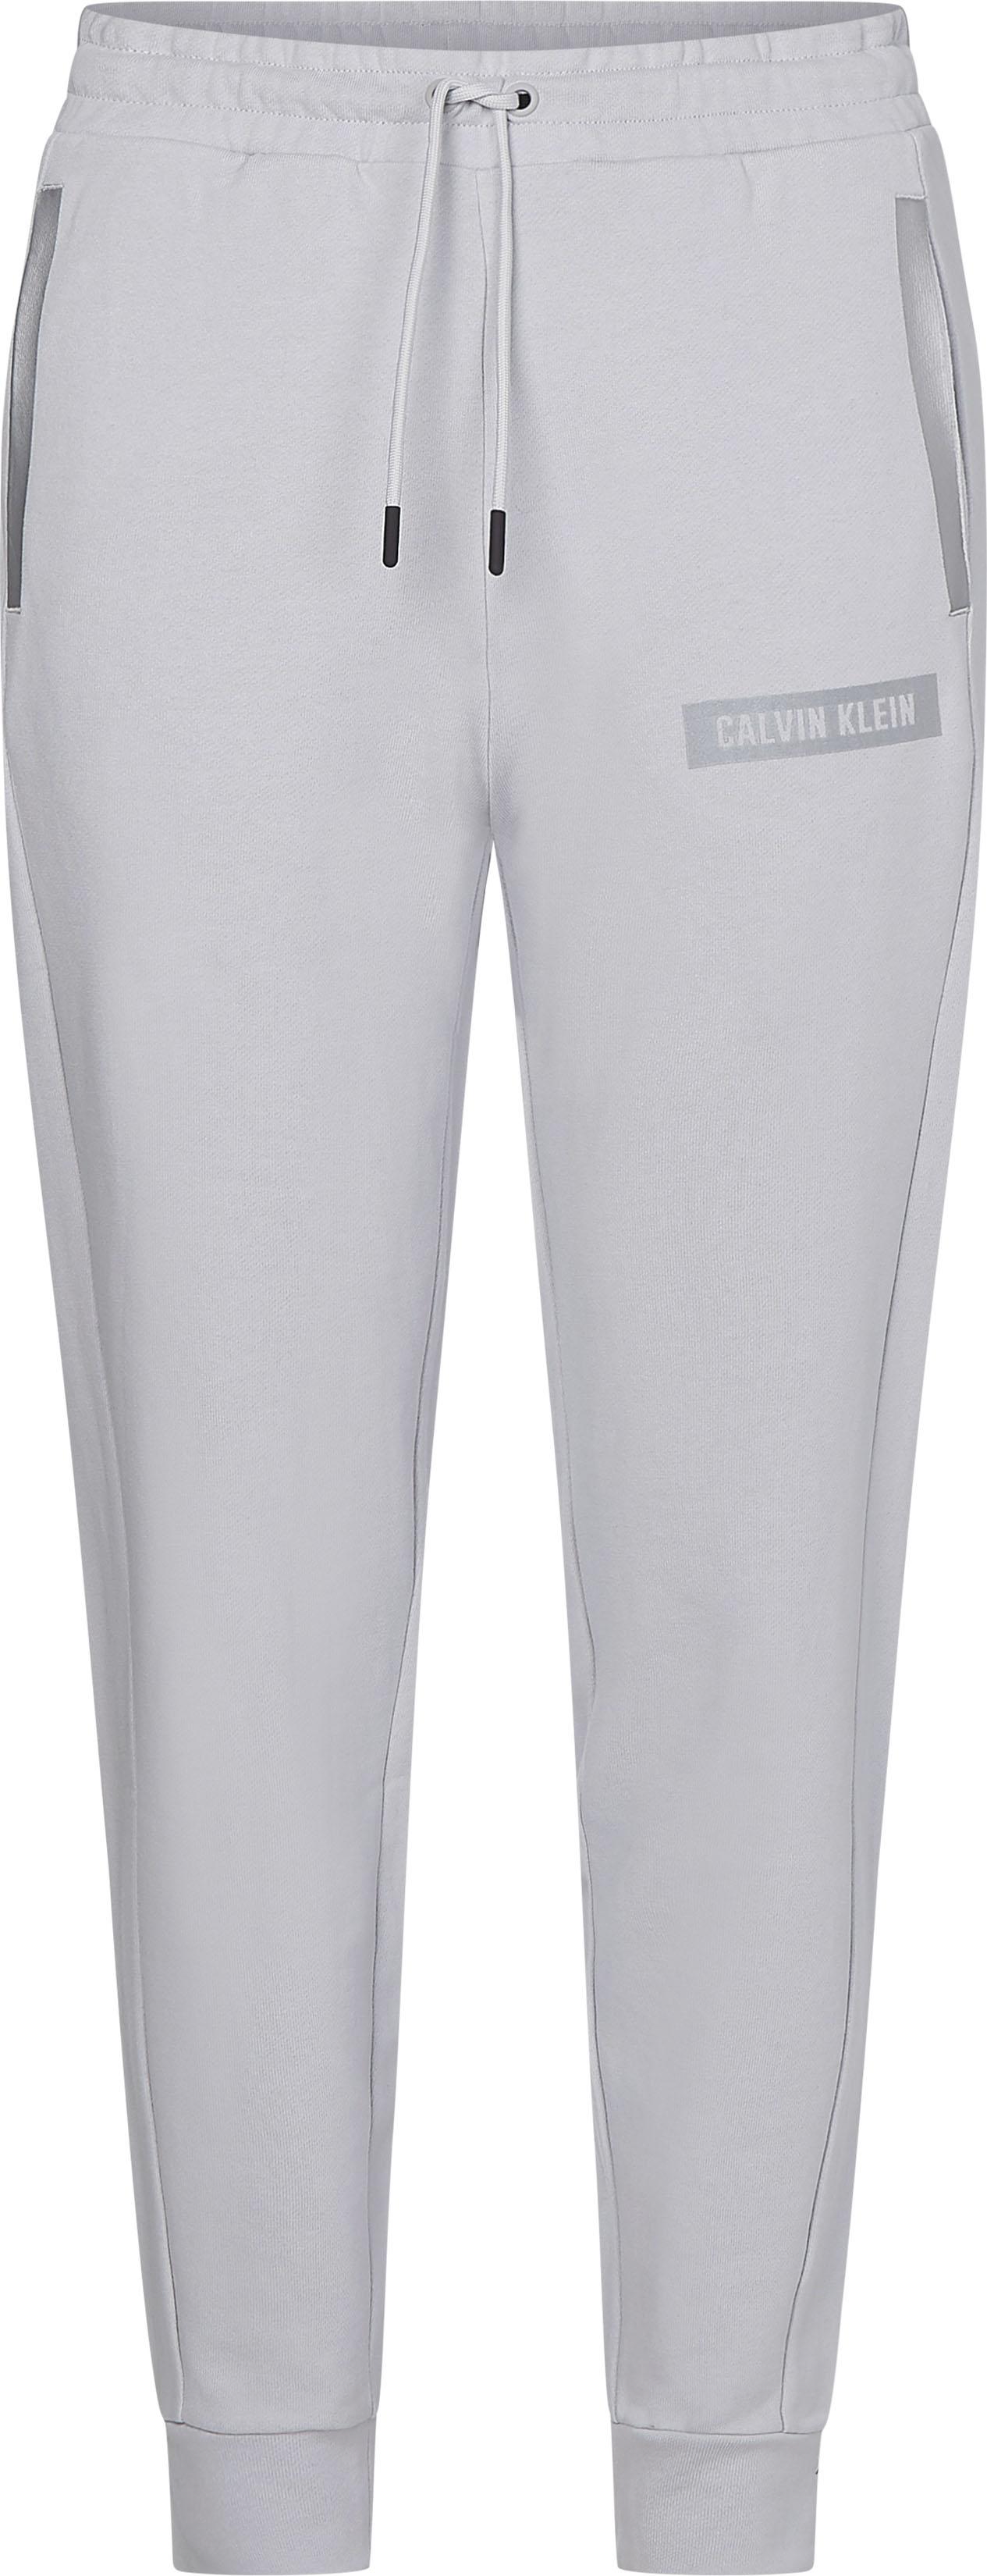 calvin klein performance -  Jogginghose PW - KNIT PANTS, mit reflektierenden, kontrastfarbenen Details